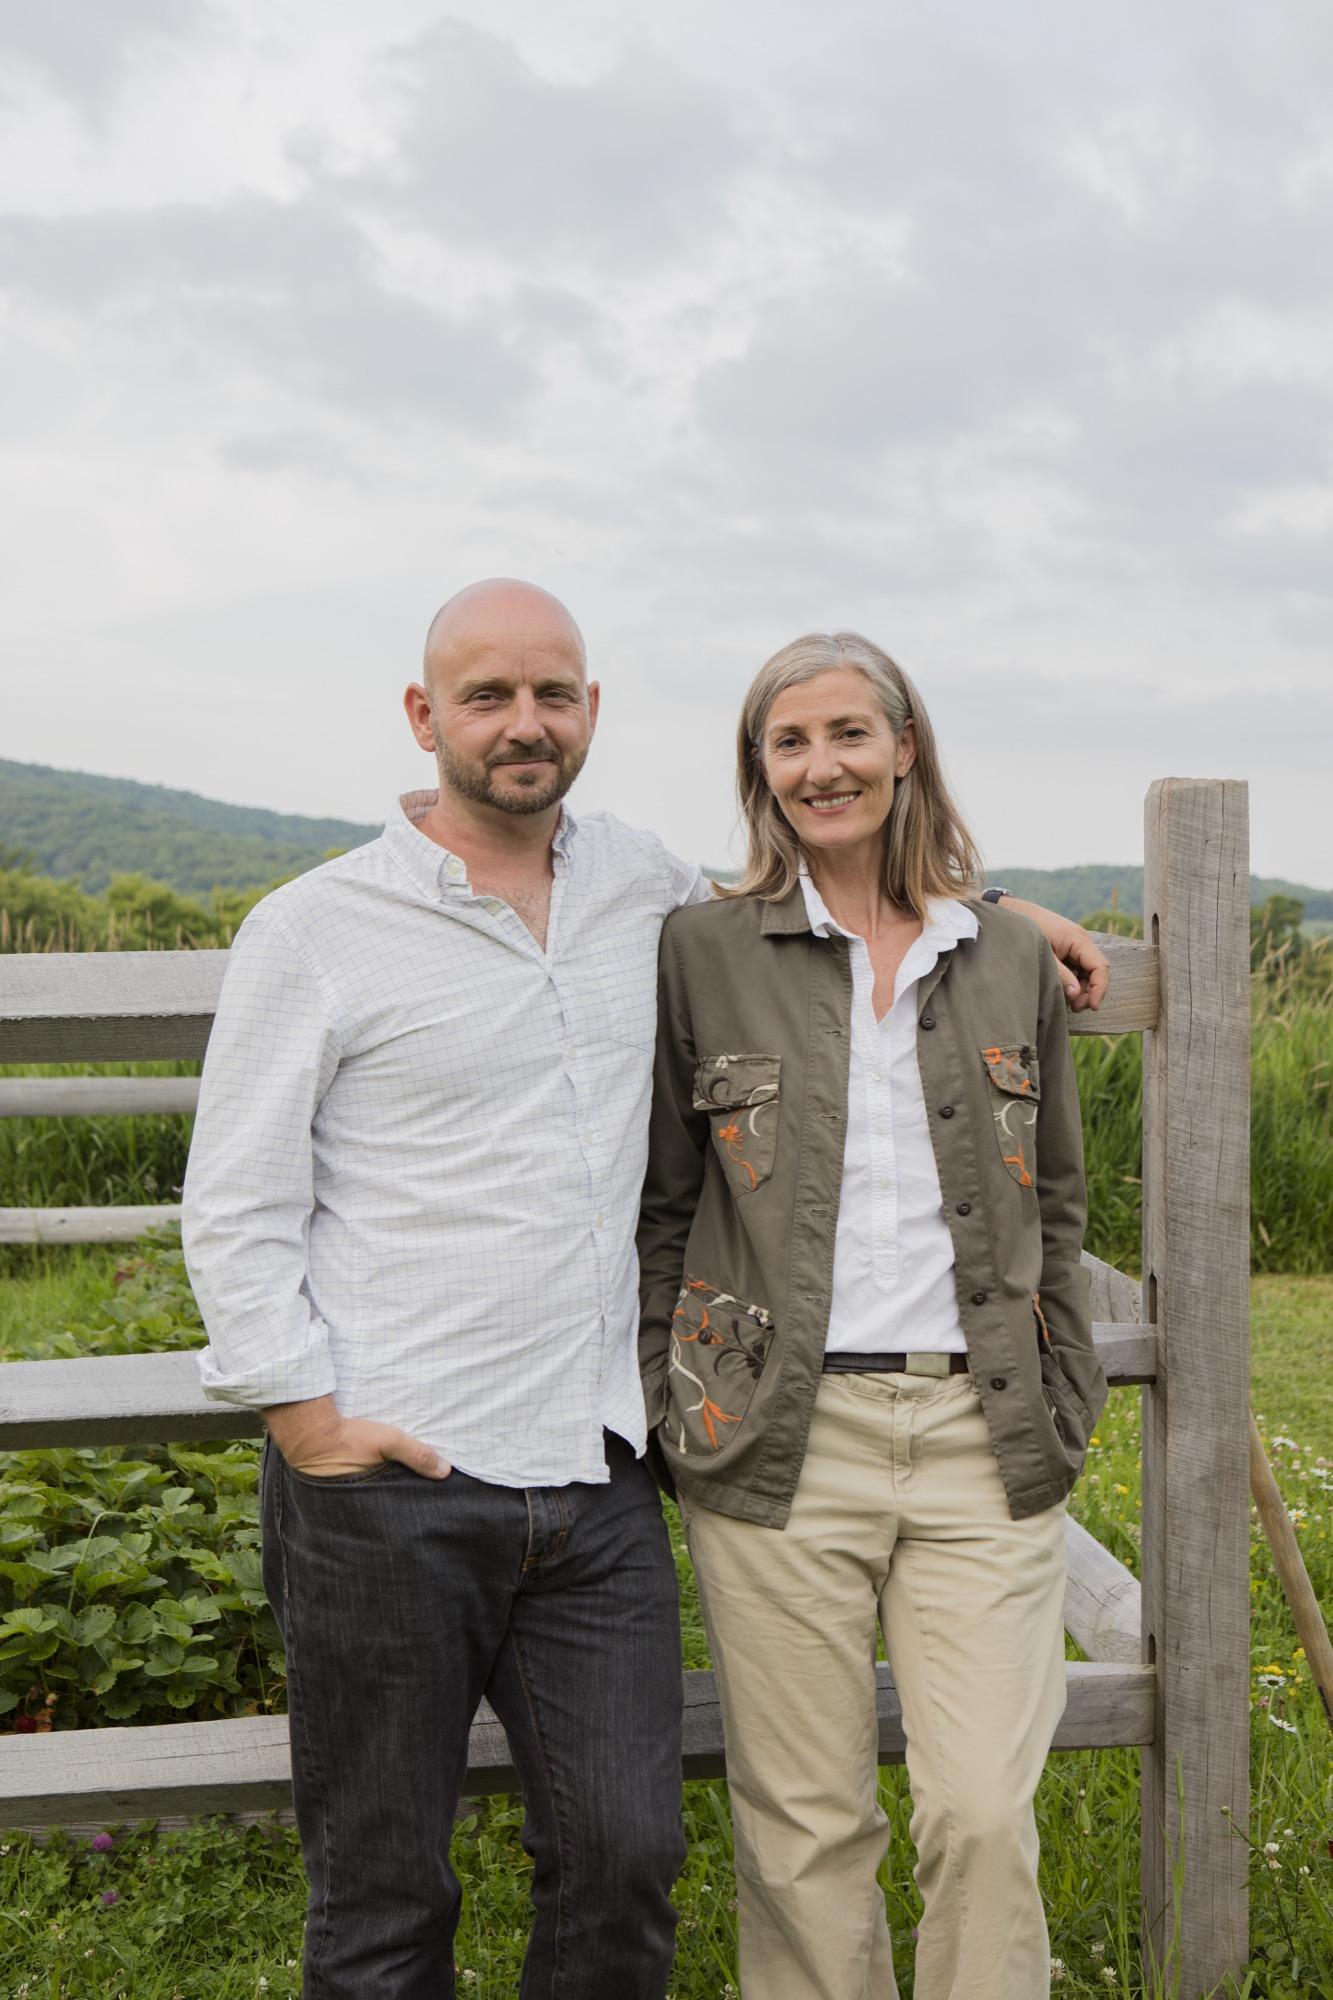 Jeanette Bronée and Torkil Stavdal / Photo by Torkil Stavdal